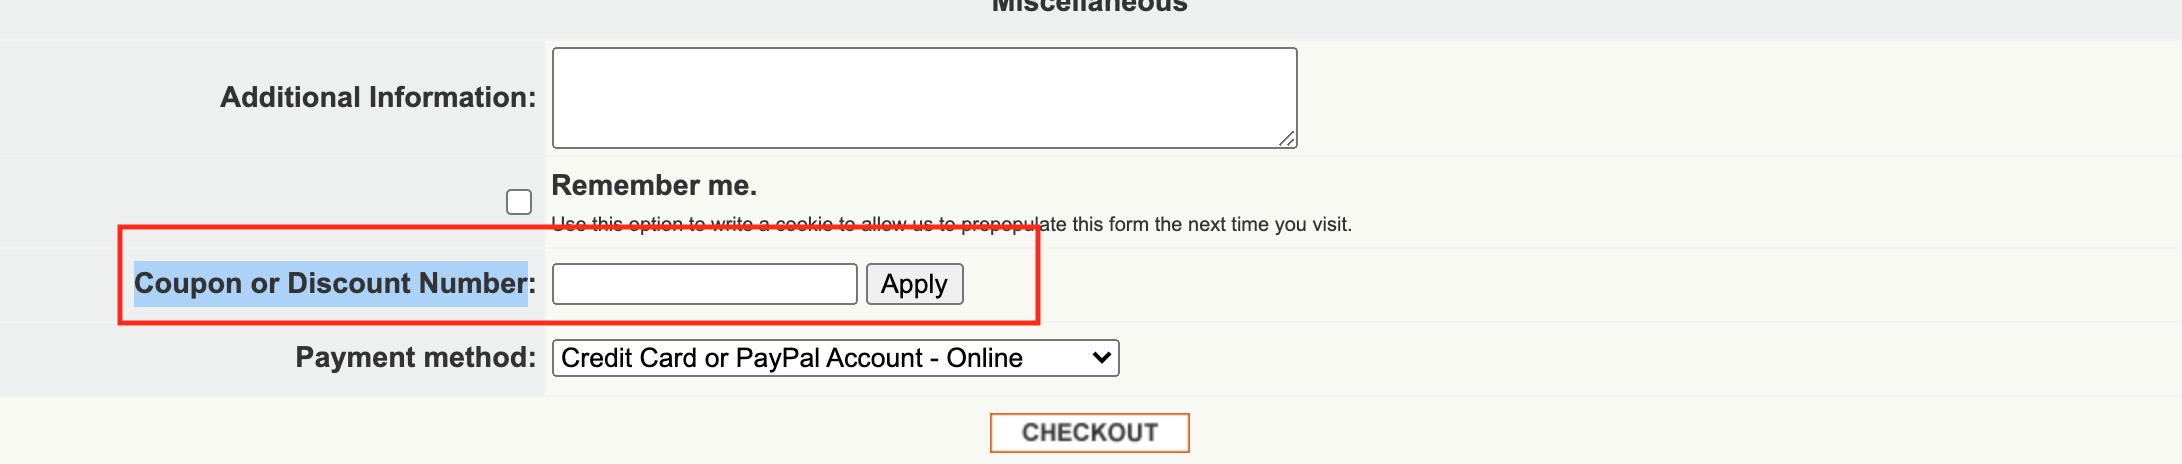 Australia Gift Shop Coupon Code